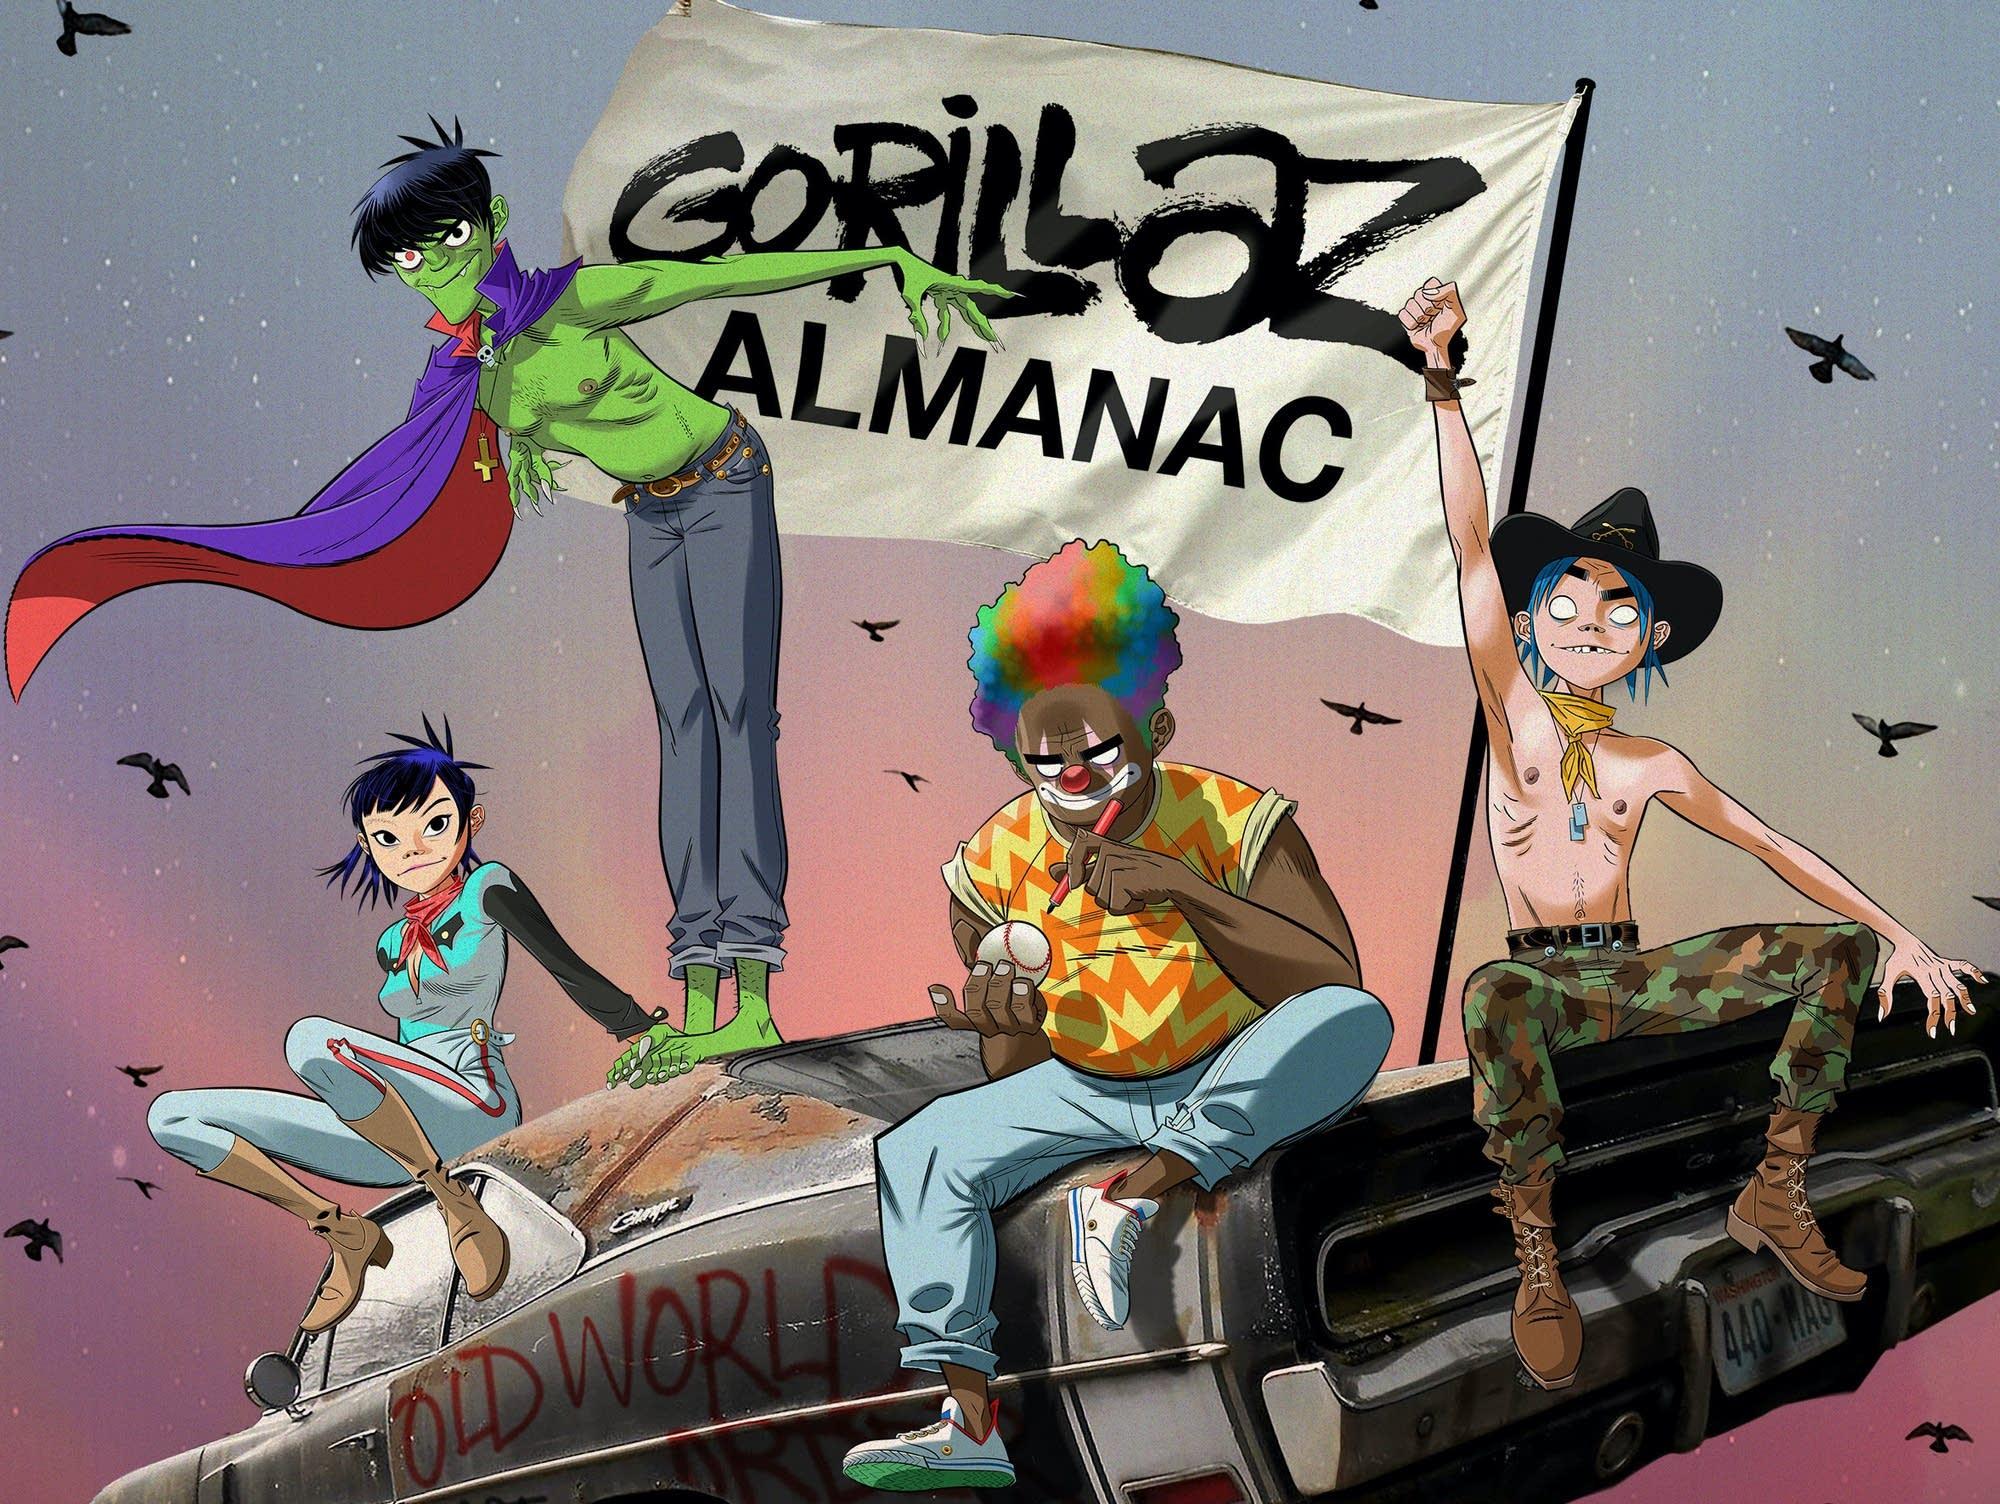 Gorillaz band members on flying car with 'Gorillaz Almanac' flag waving.